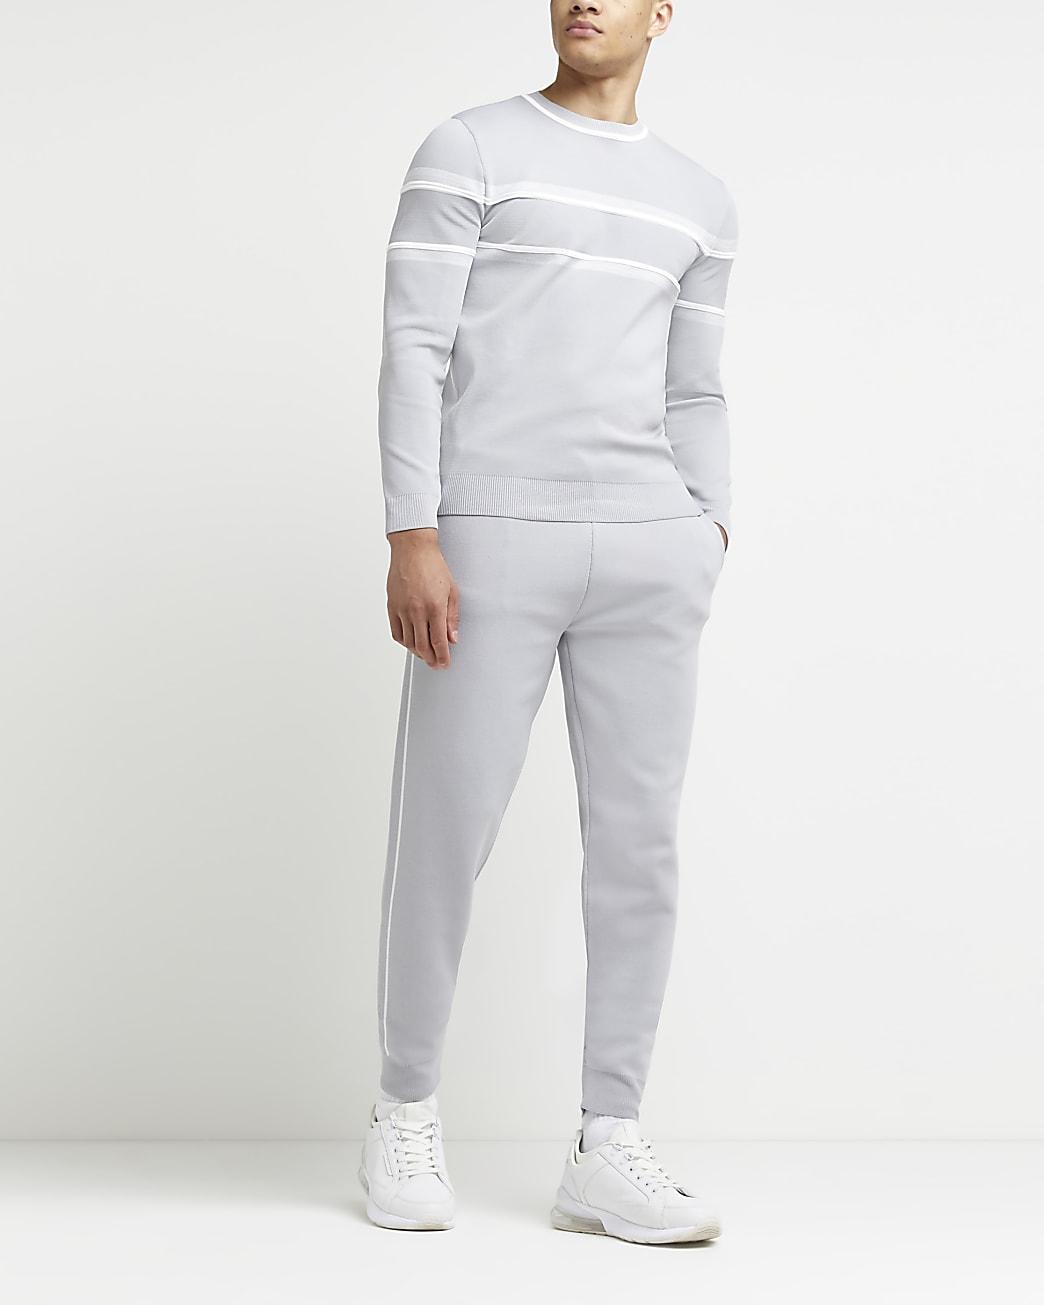 Grey side stripe slim fit joggers